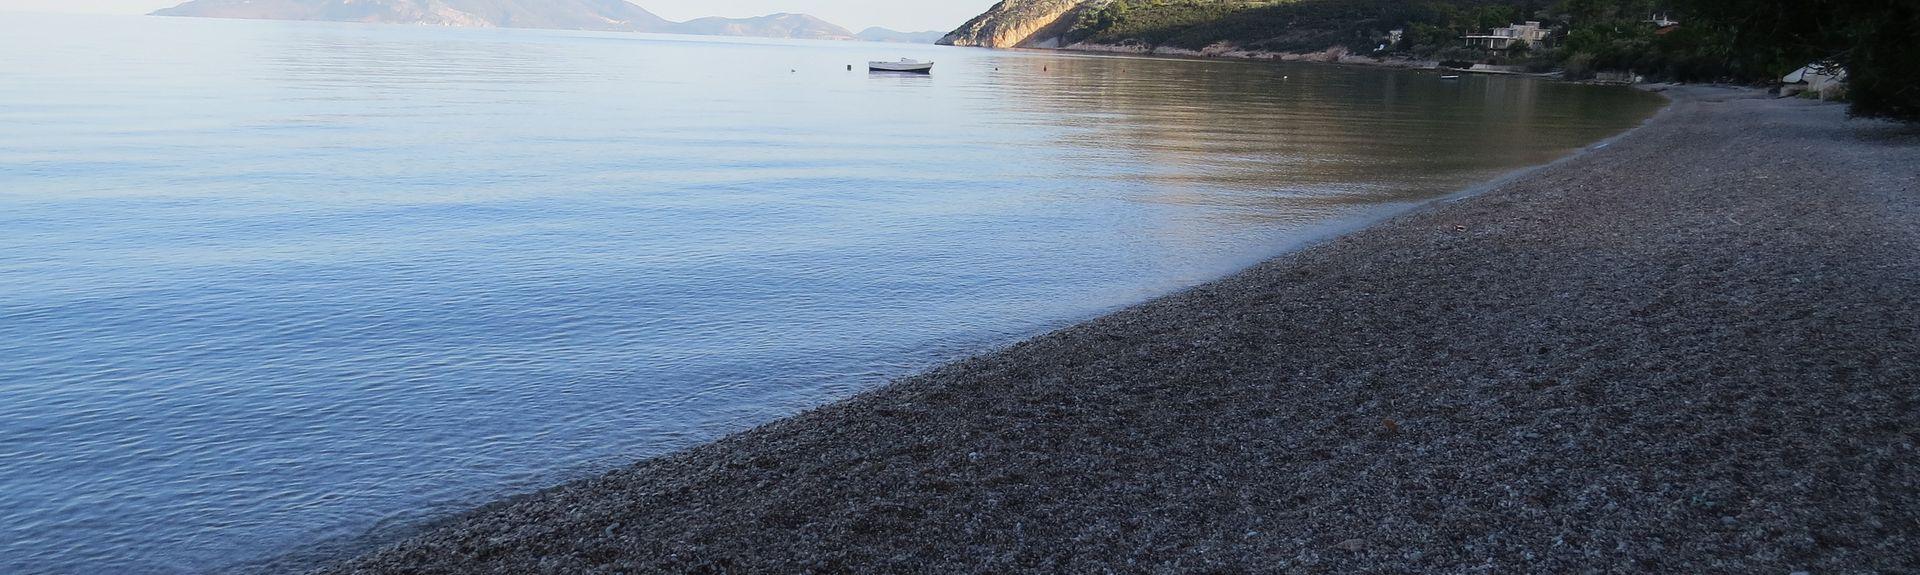 Tolo strand, Nafplio, Peloponnes, Hellas